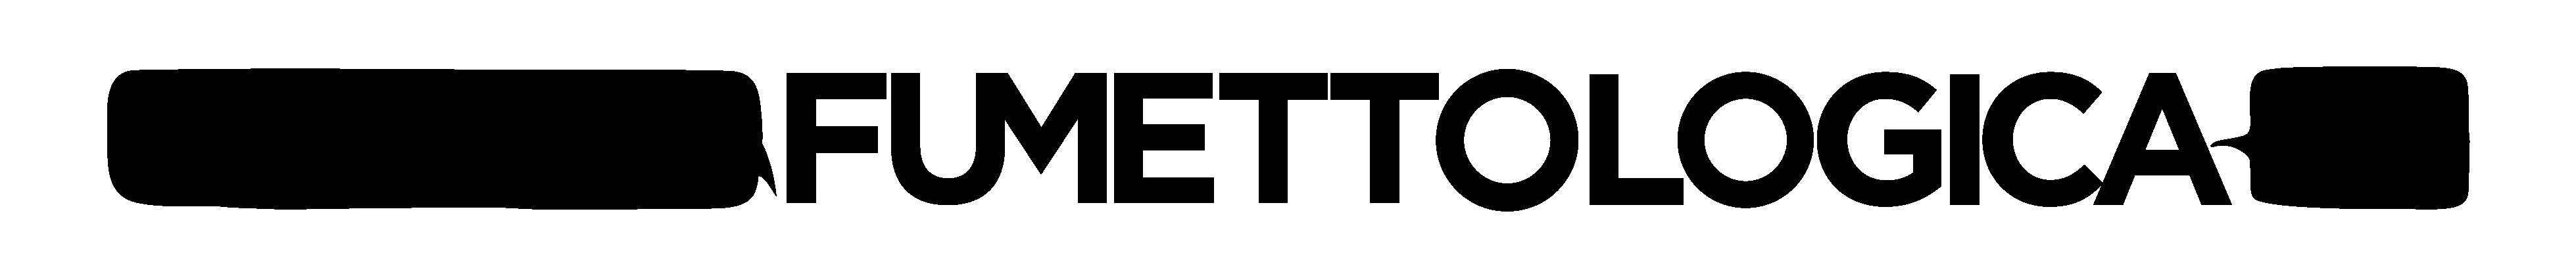 fumettologica-logo-tumblr